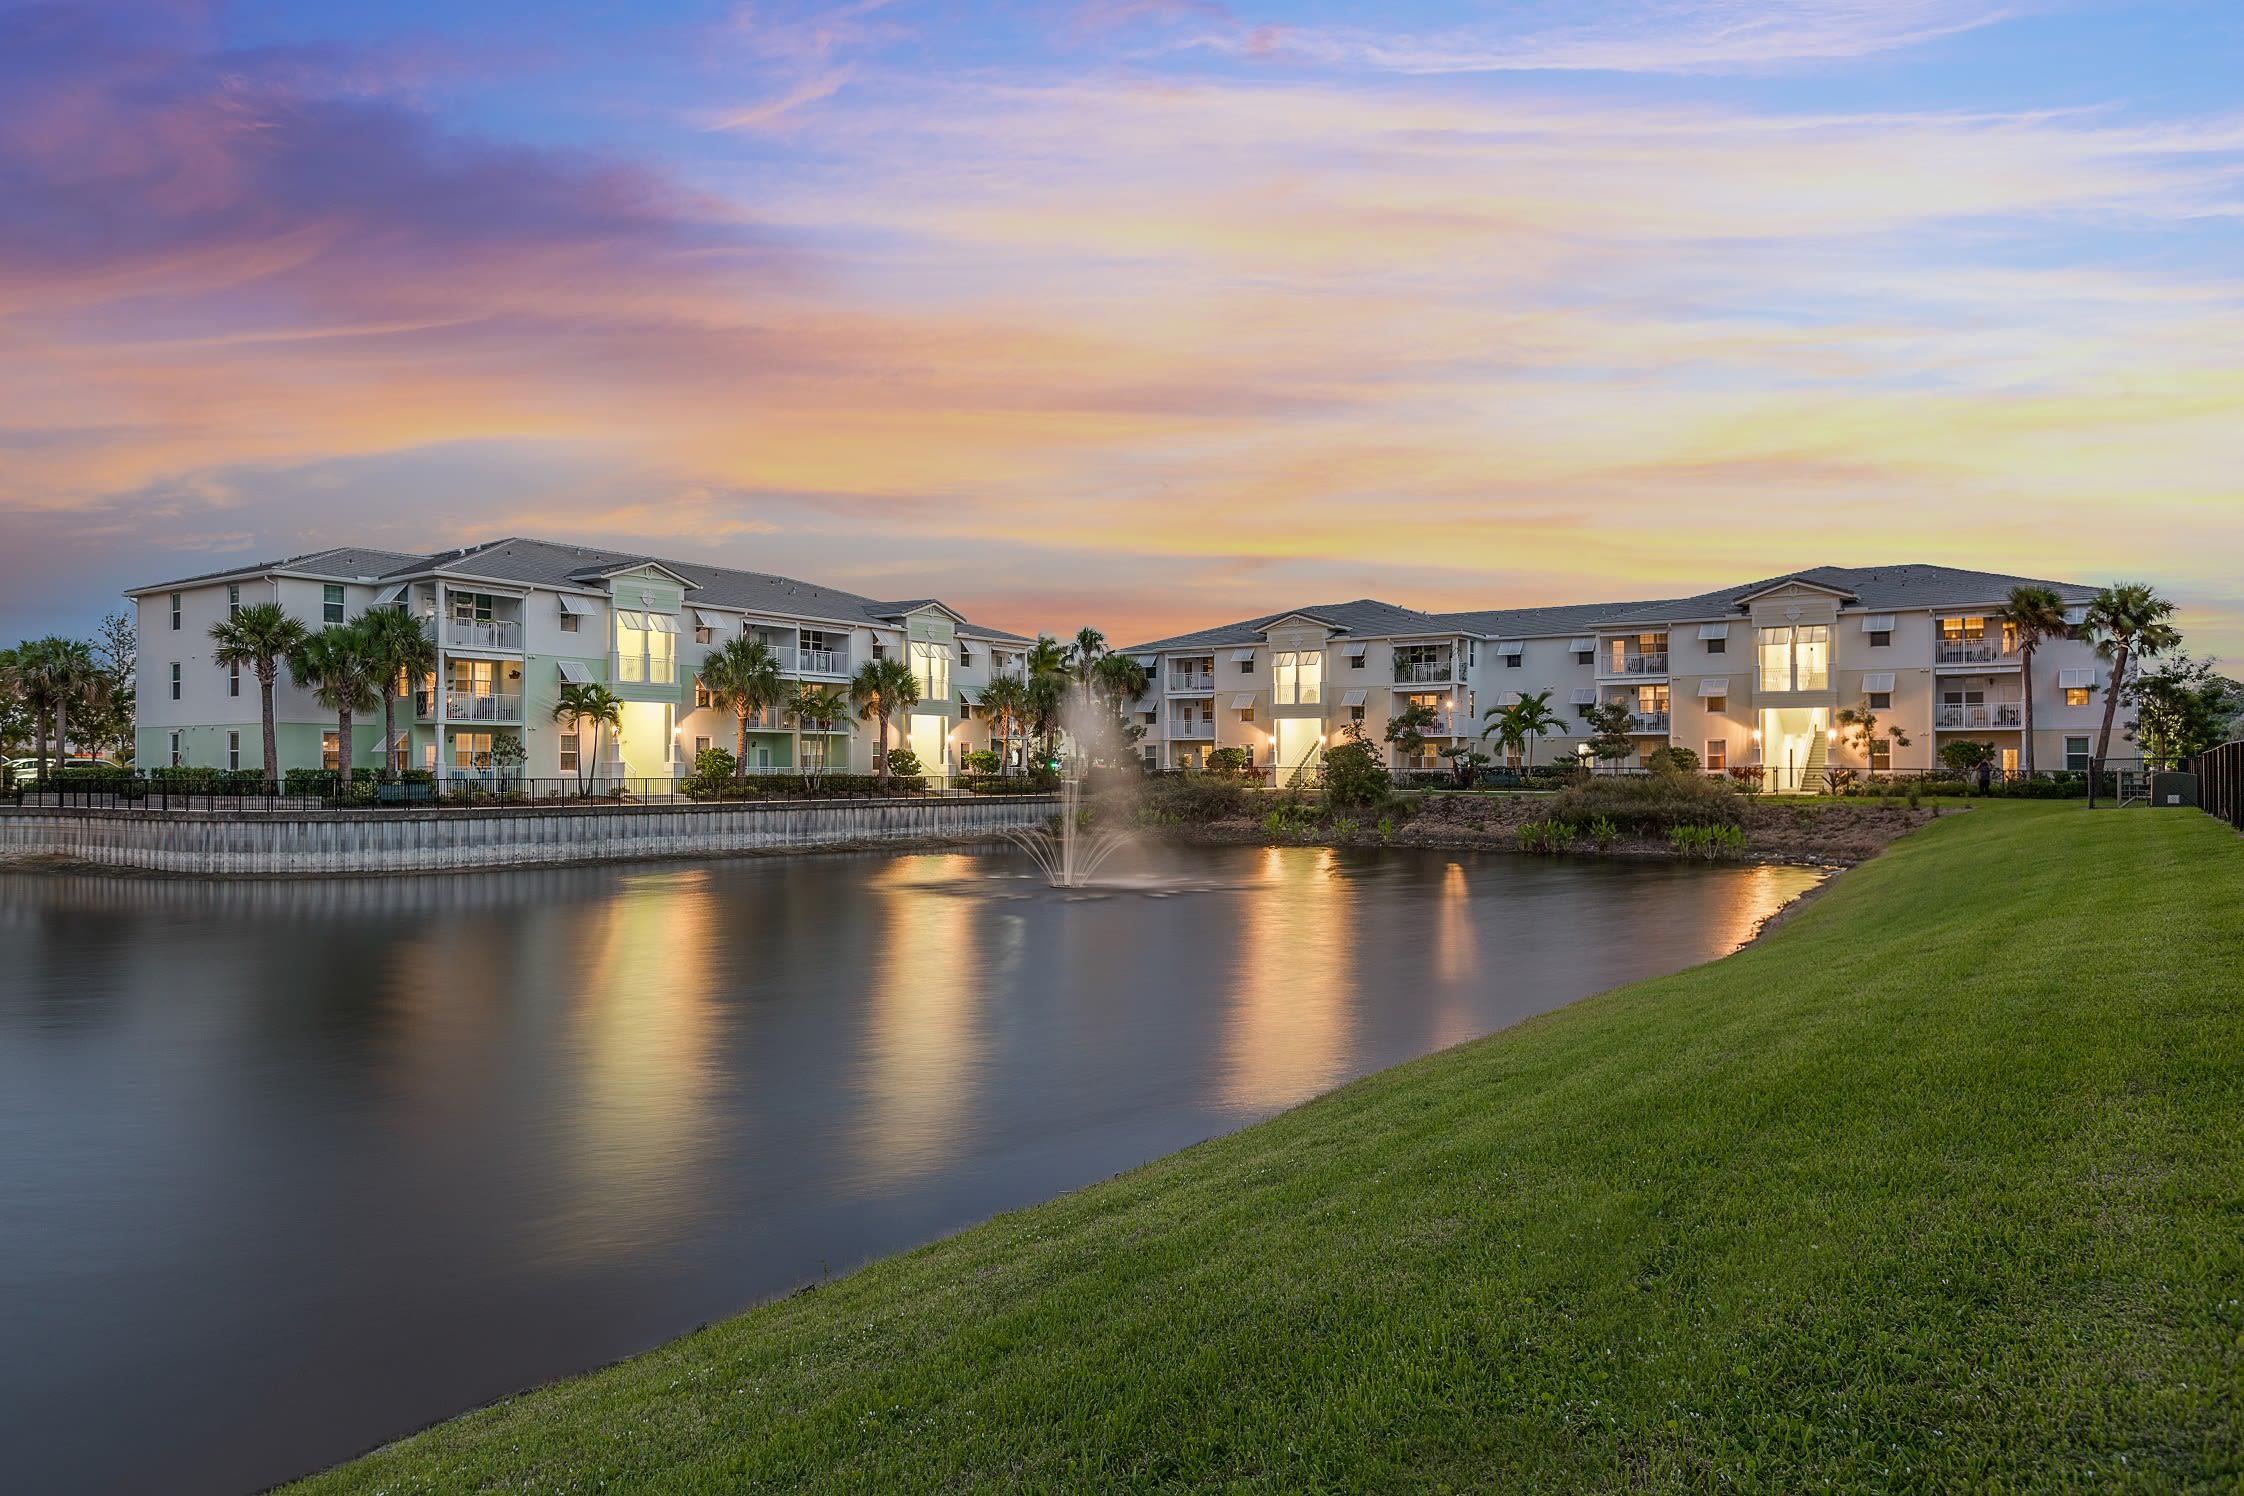 Apartments at High Ridge Landing in Boynton Beach, Florida